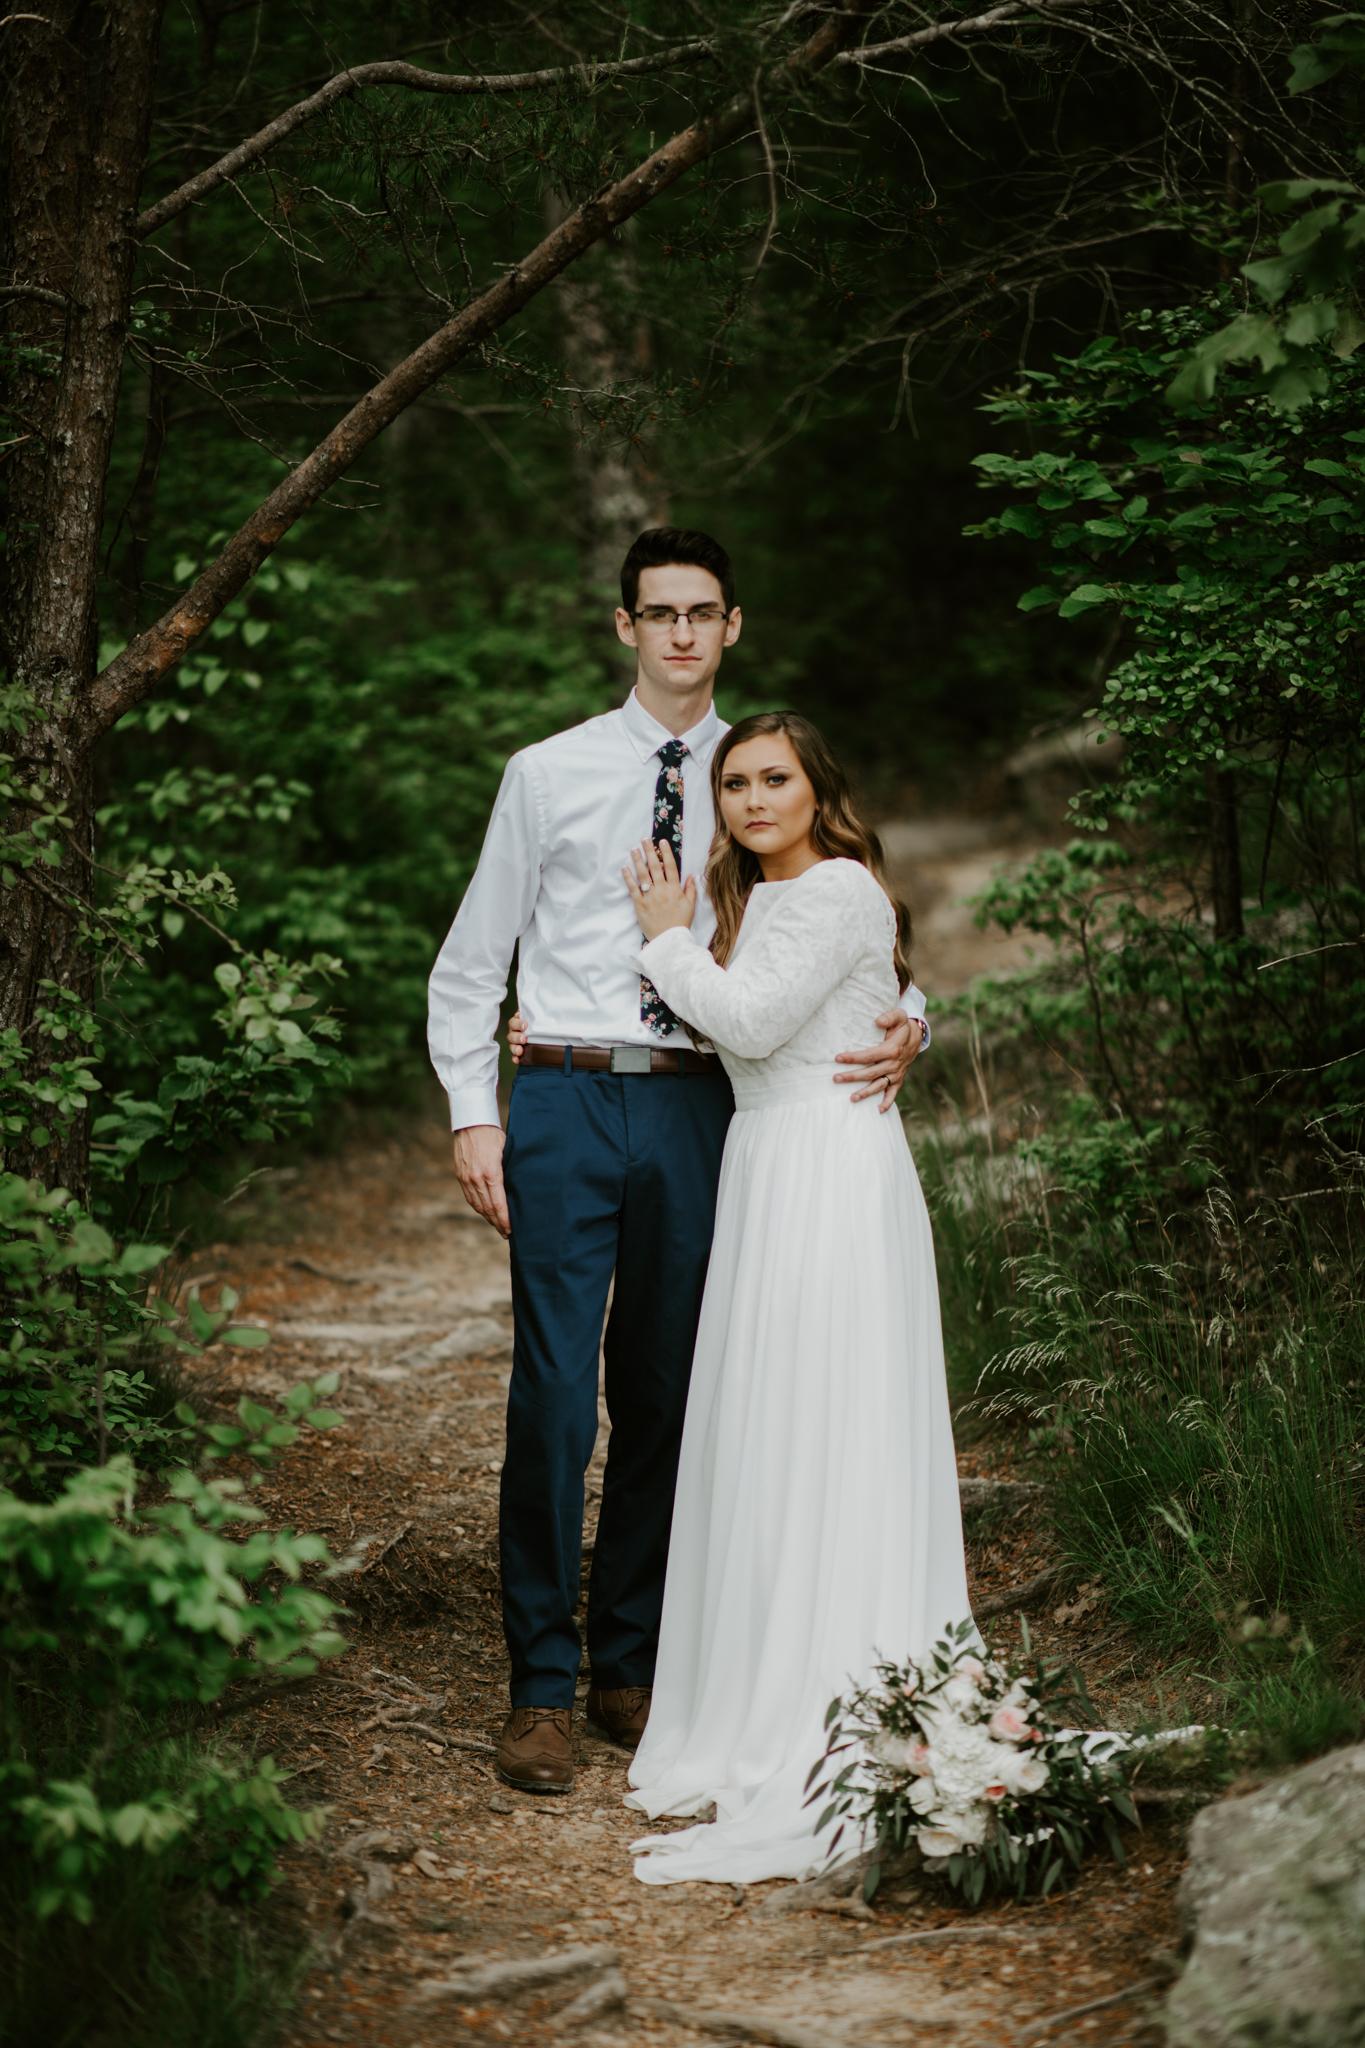 Lacey-Joe-Chattanooga-Nashville-Tennessee-Wedding-Elopement-Photographer-139.jpg